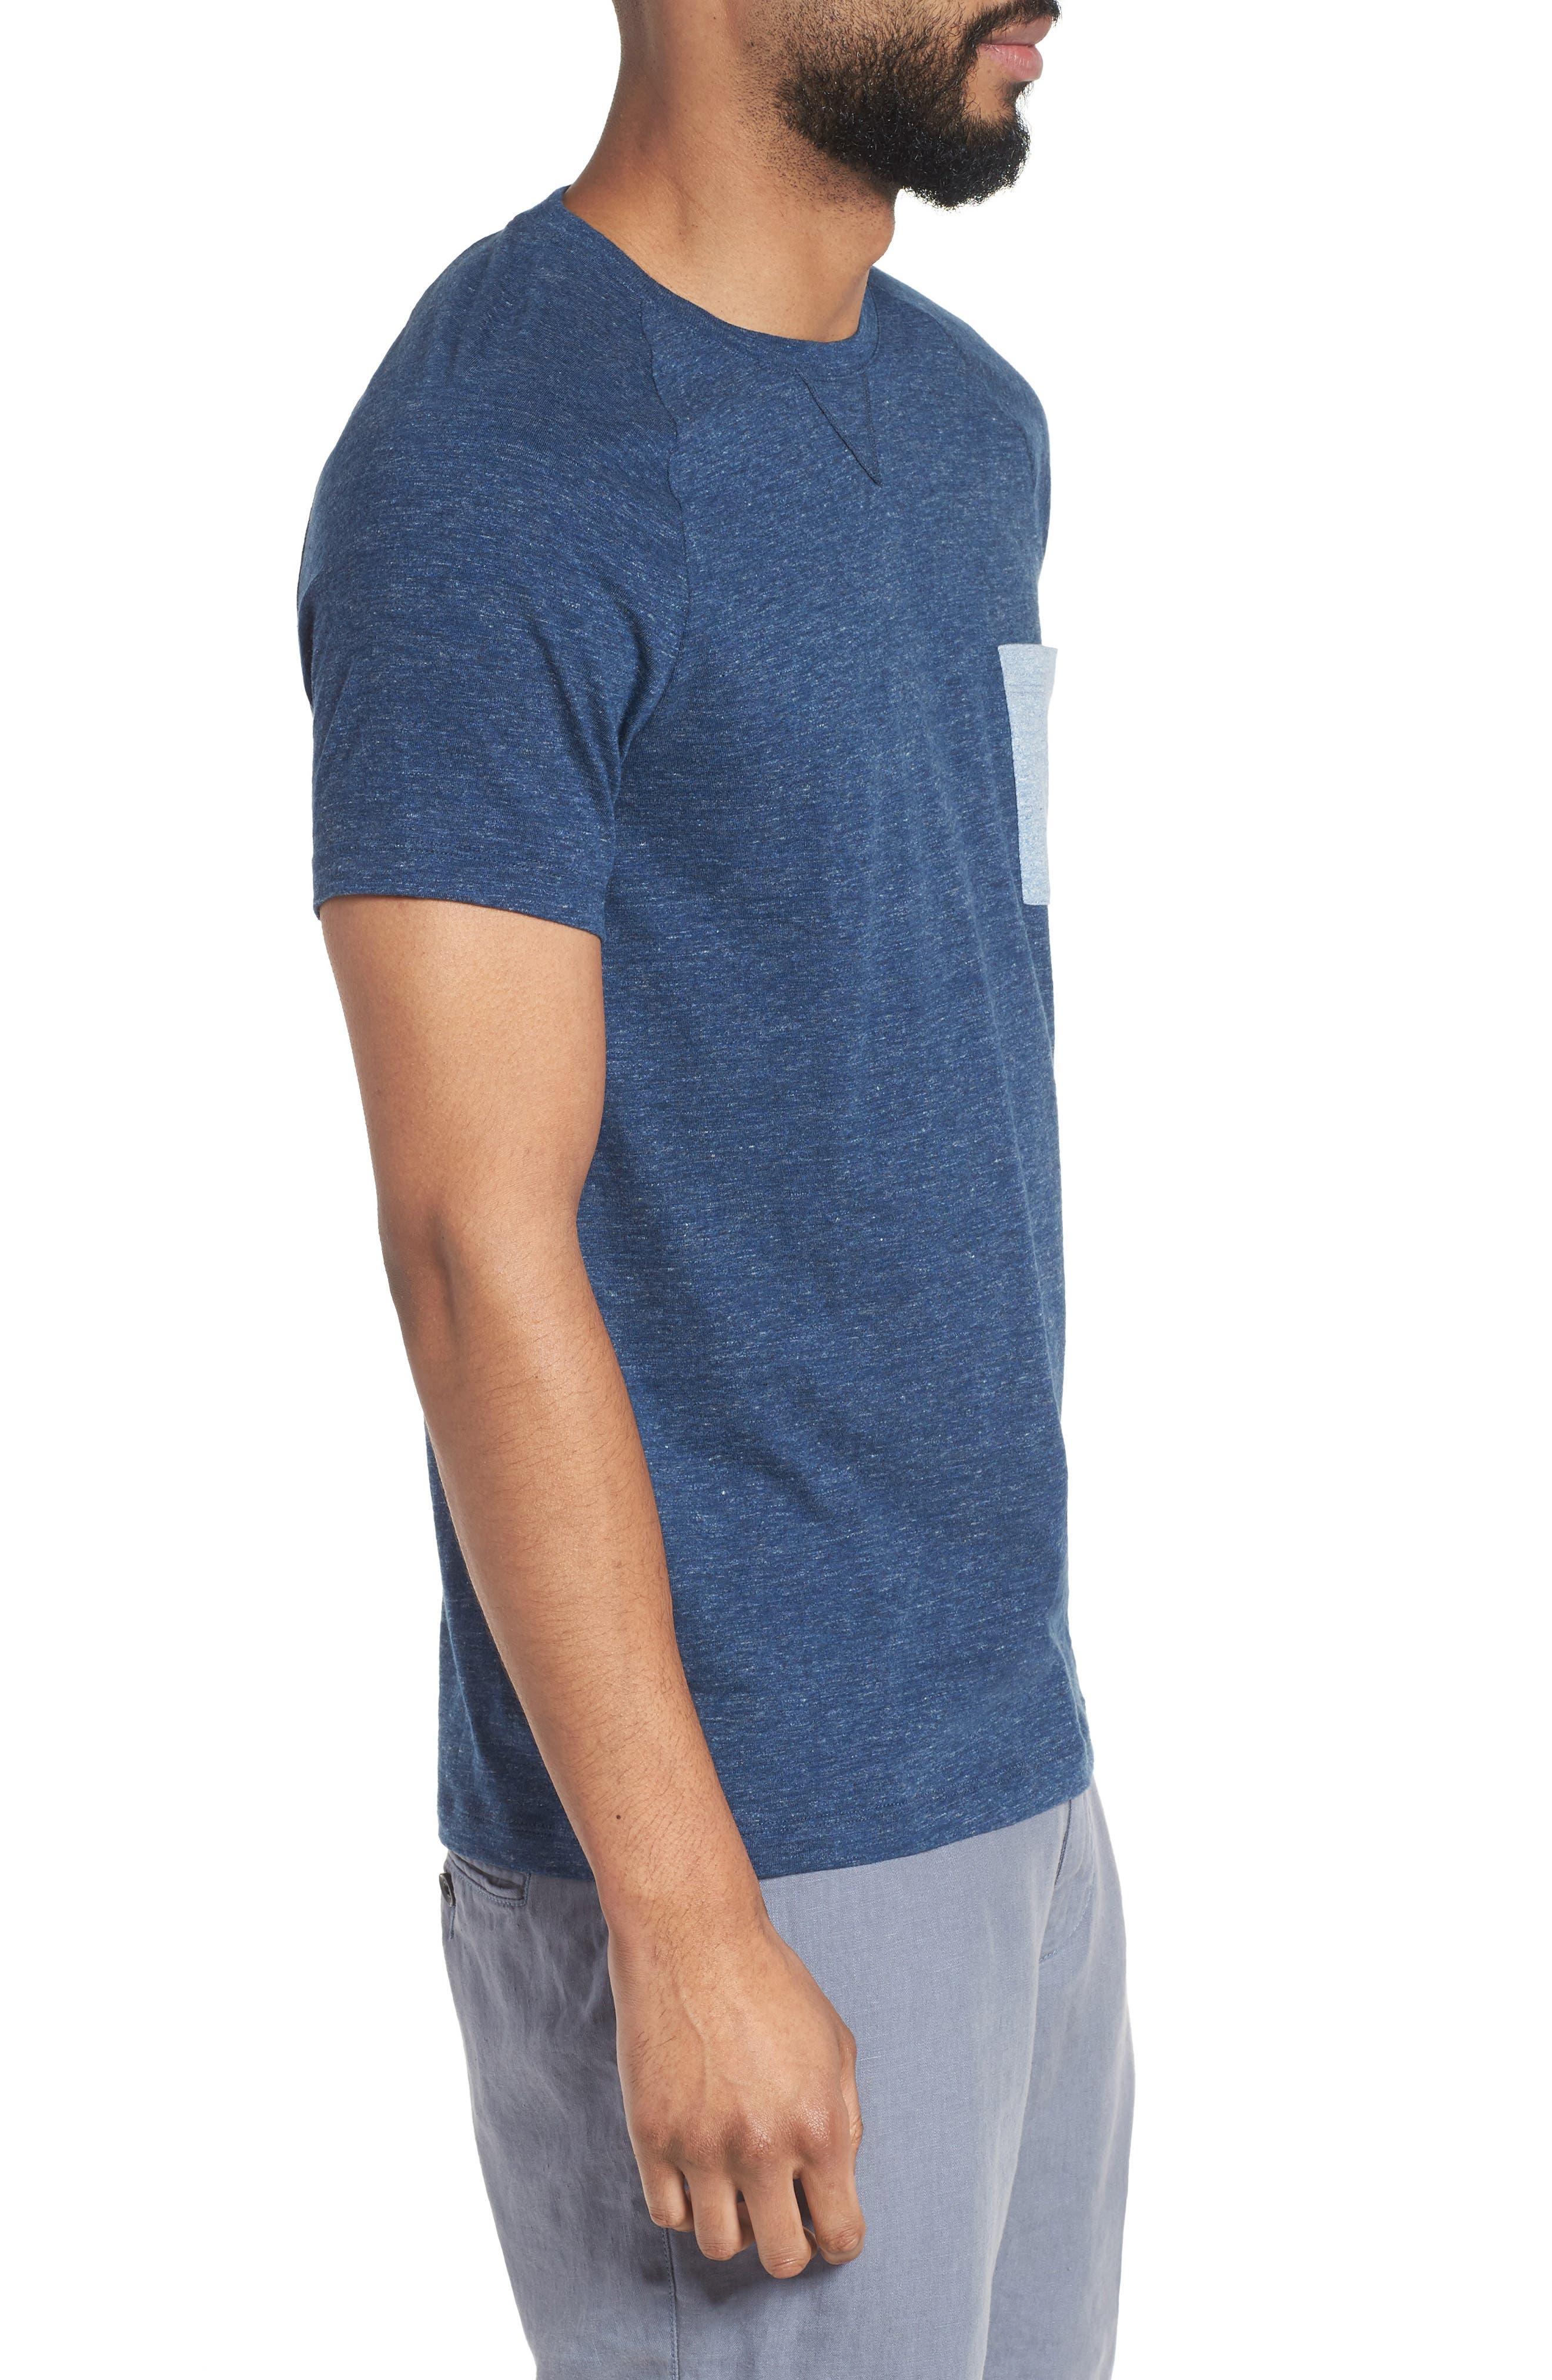 Tessler Slim Fit Pocket T-Shirt,                             Alternate thumbnail 3, color,                             Blue